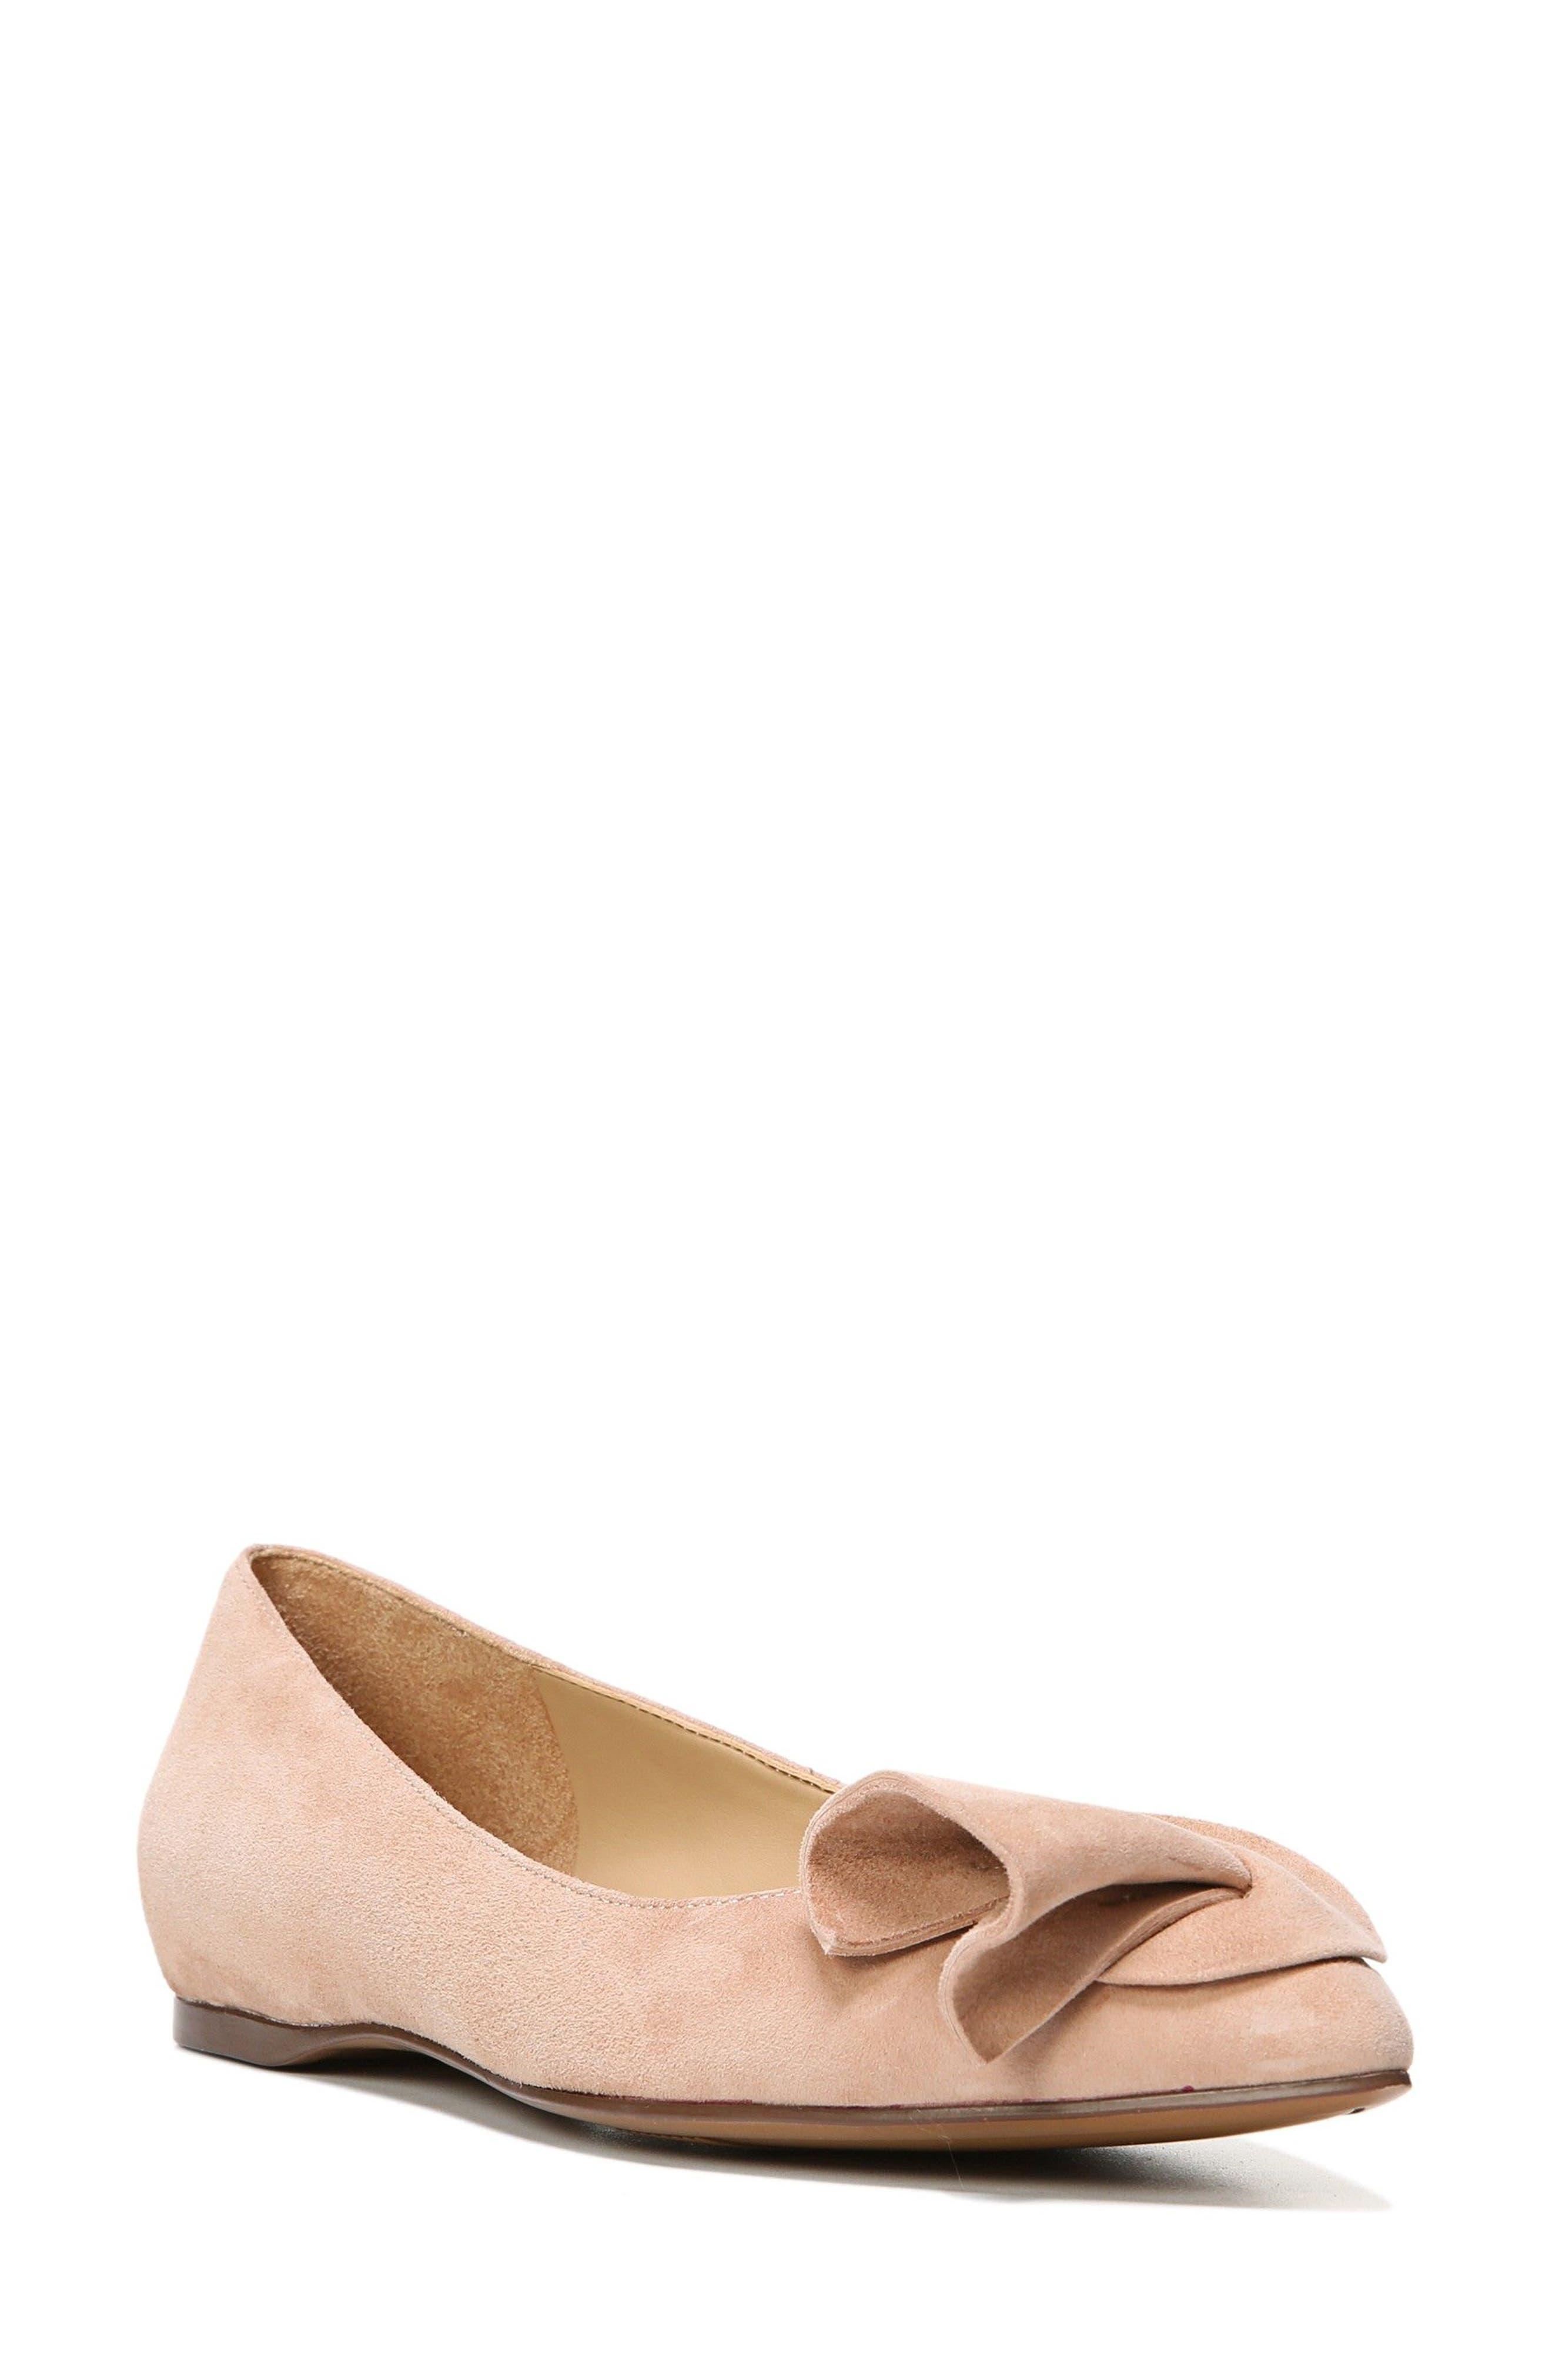 Naturalizer Sarah Pointy Toe Flat (Women)